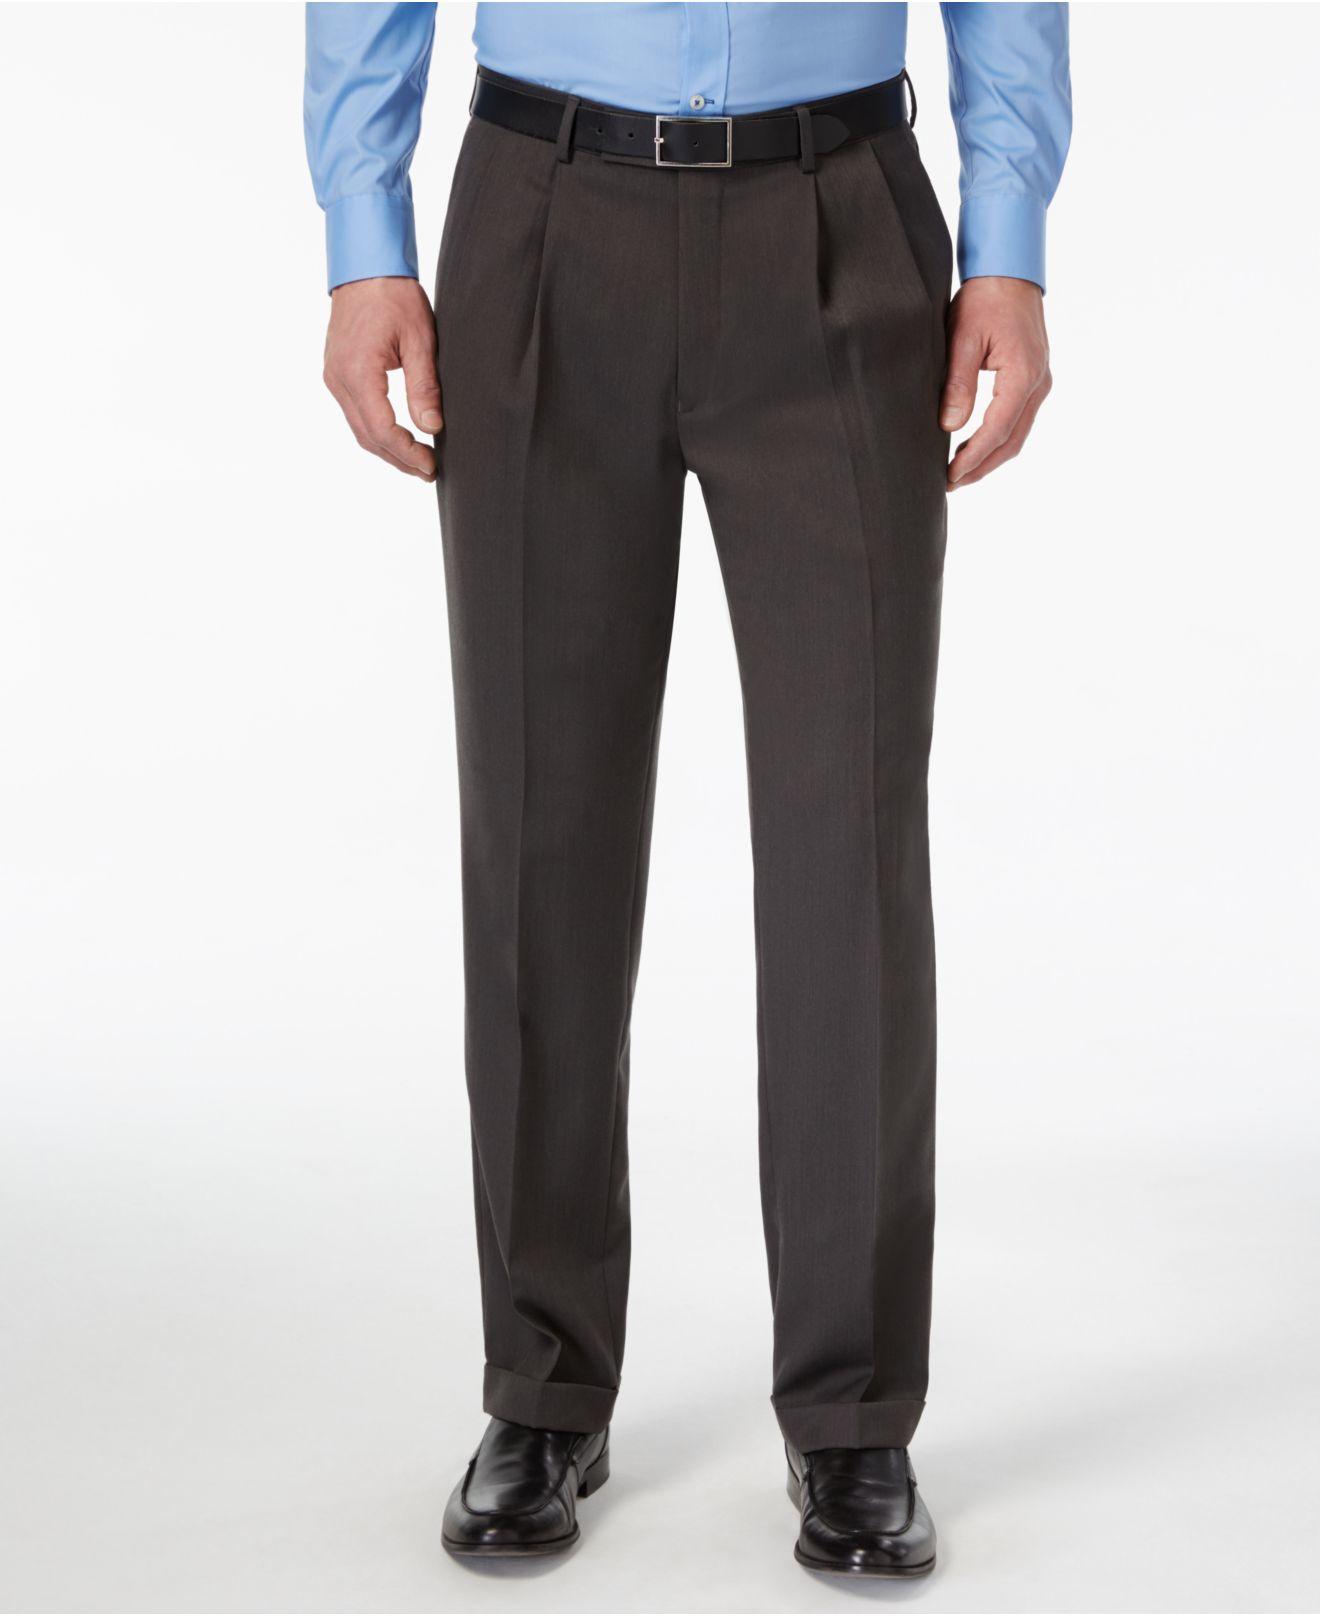 Charcoal Dress Pants Shoes